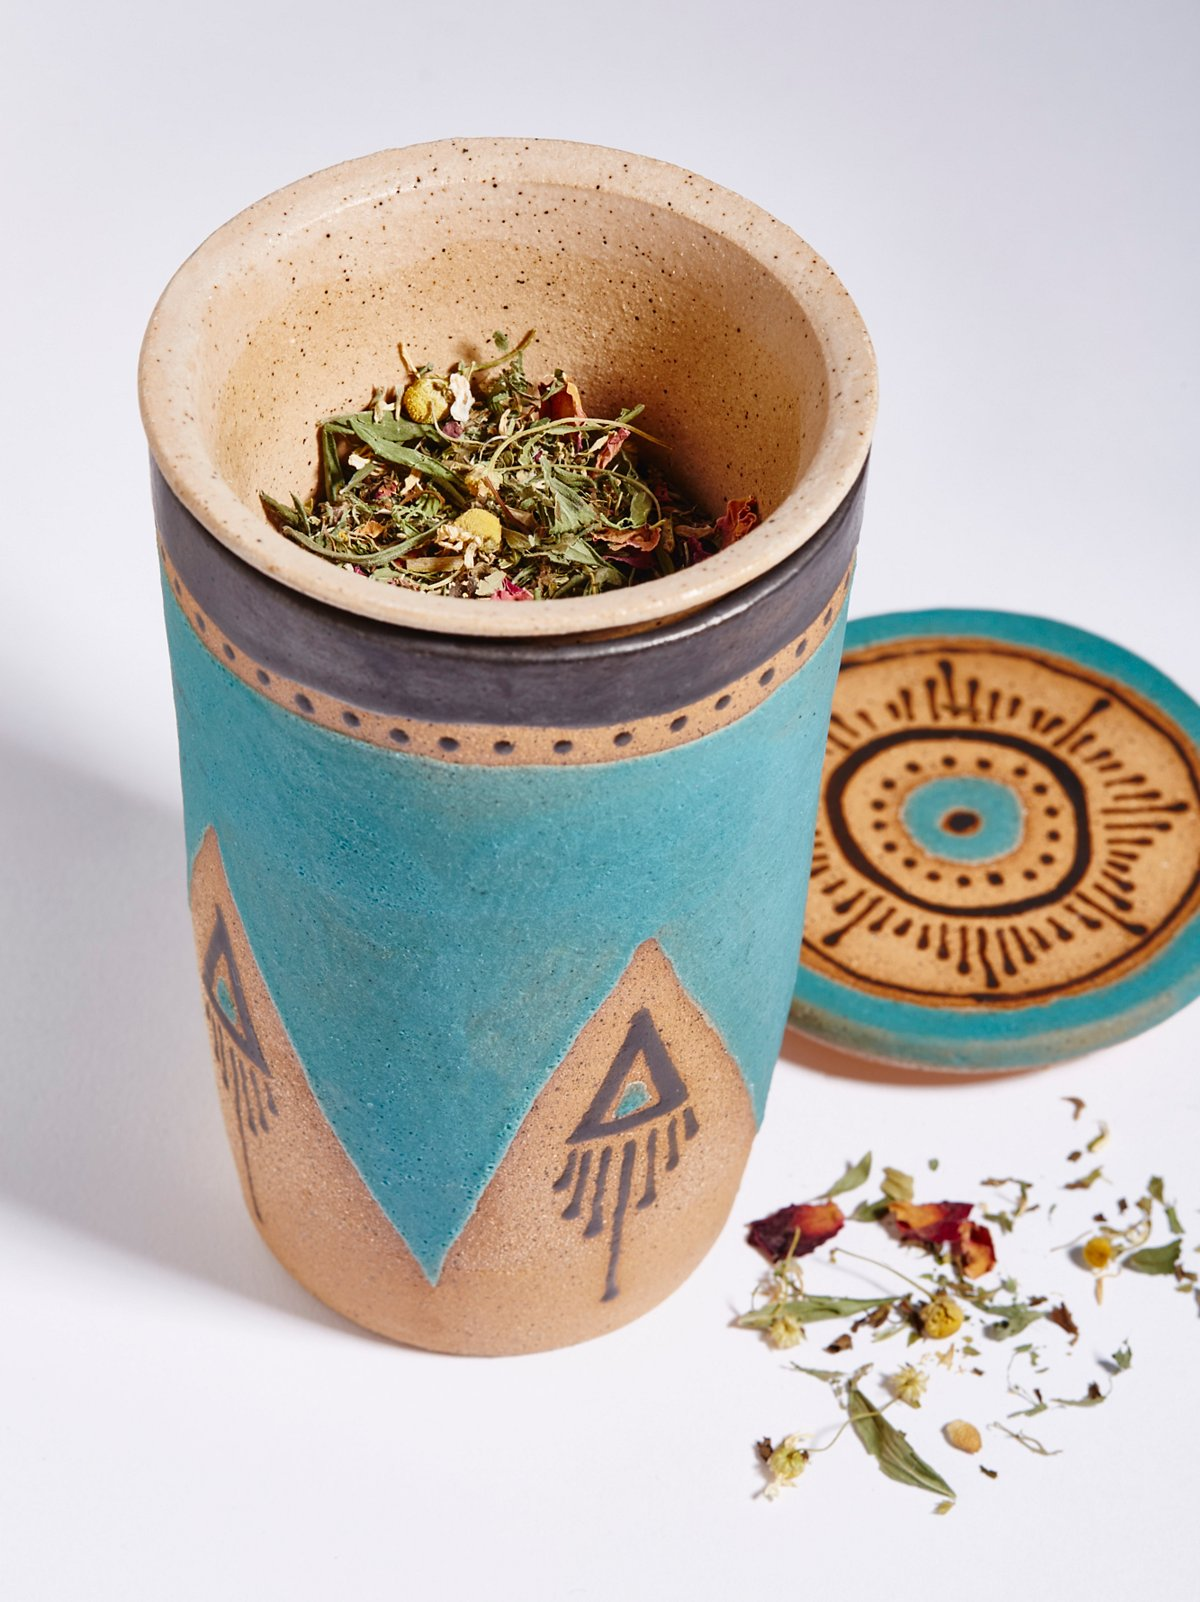 To Go Steeping Tea Mug, Victoria Smith Ceramics, Free People, $68